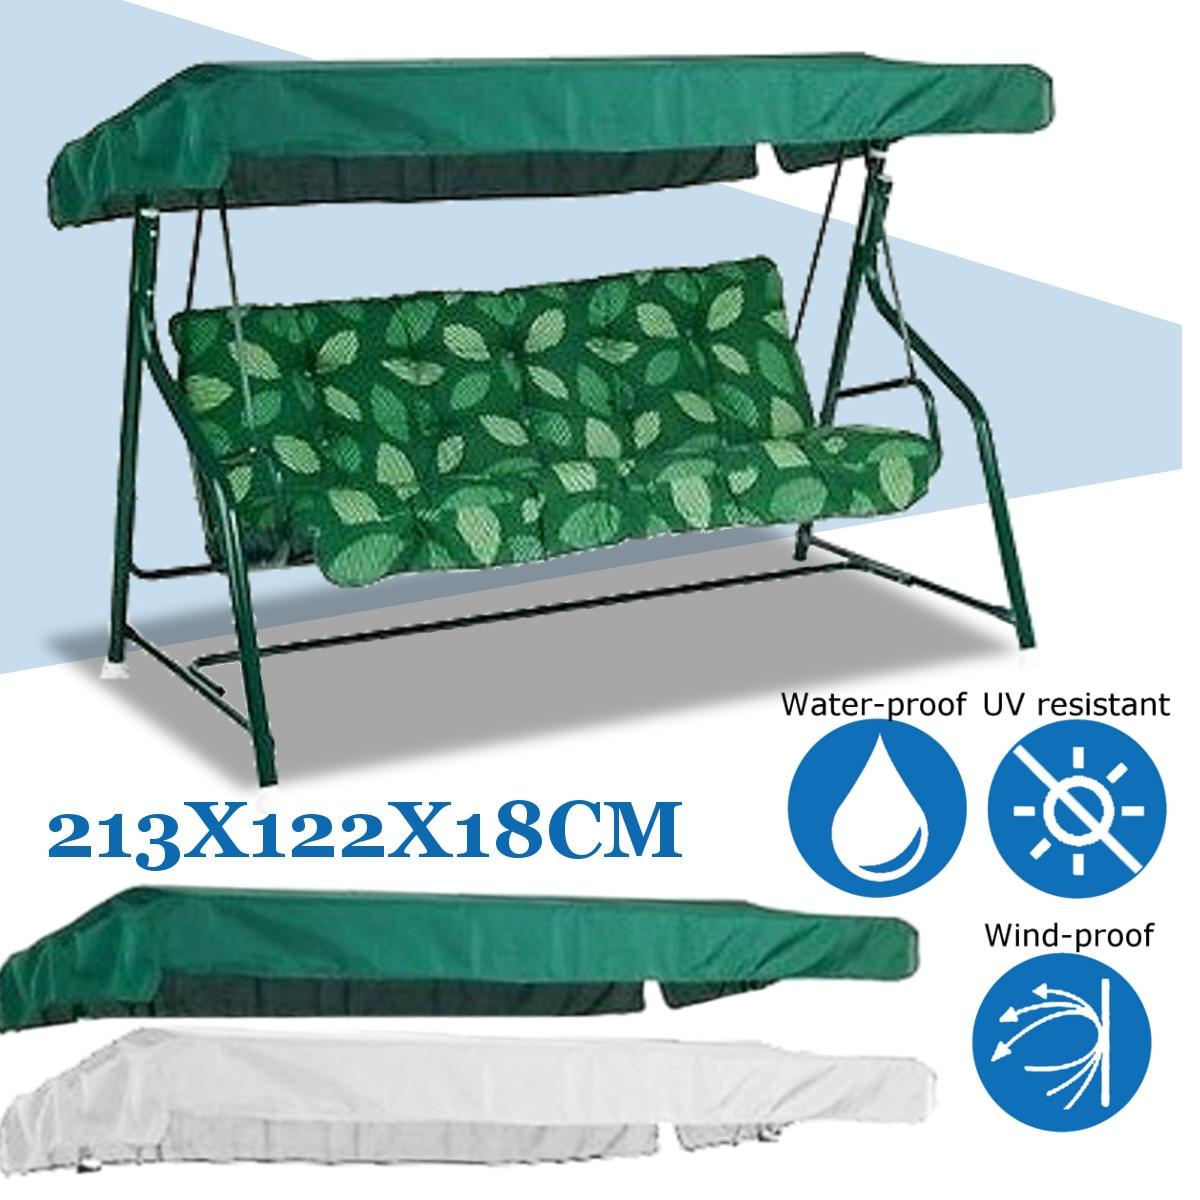 Silla Columpio de jardín cubierta de toldo sombra vela impermeable Anti UV de polvo silla superior al aire libre dosel reemplazo patio 213X122cm